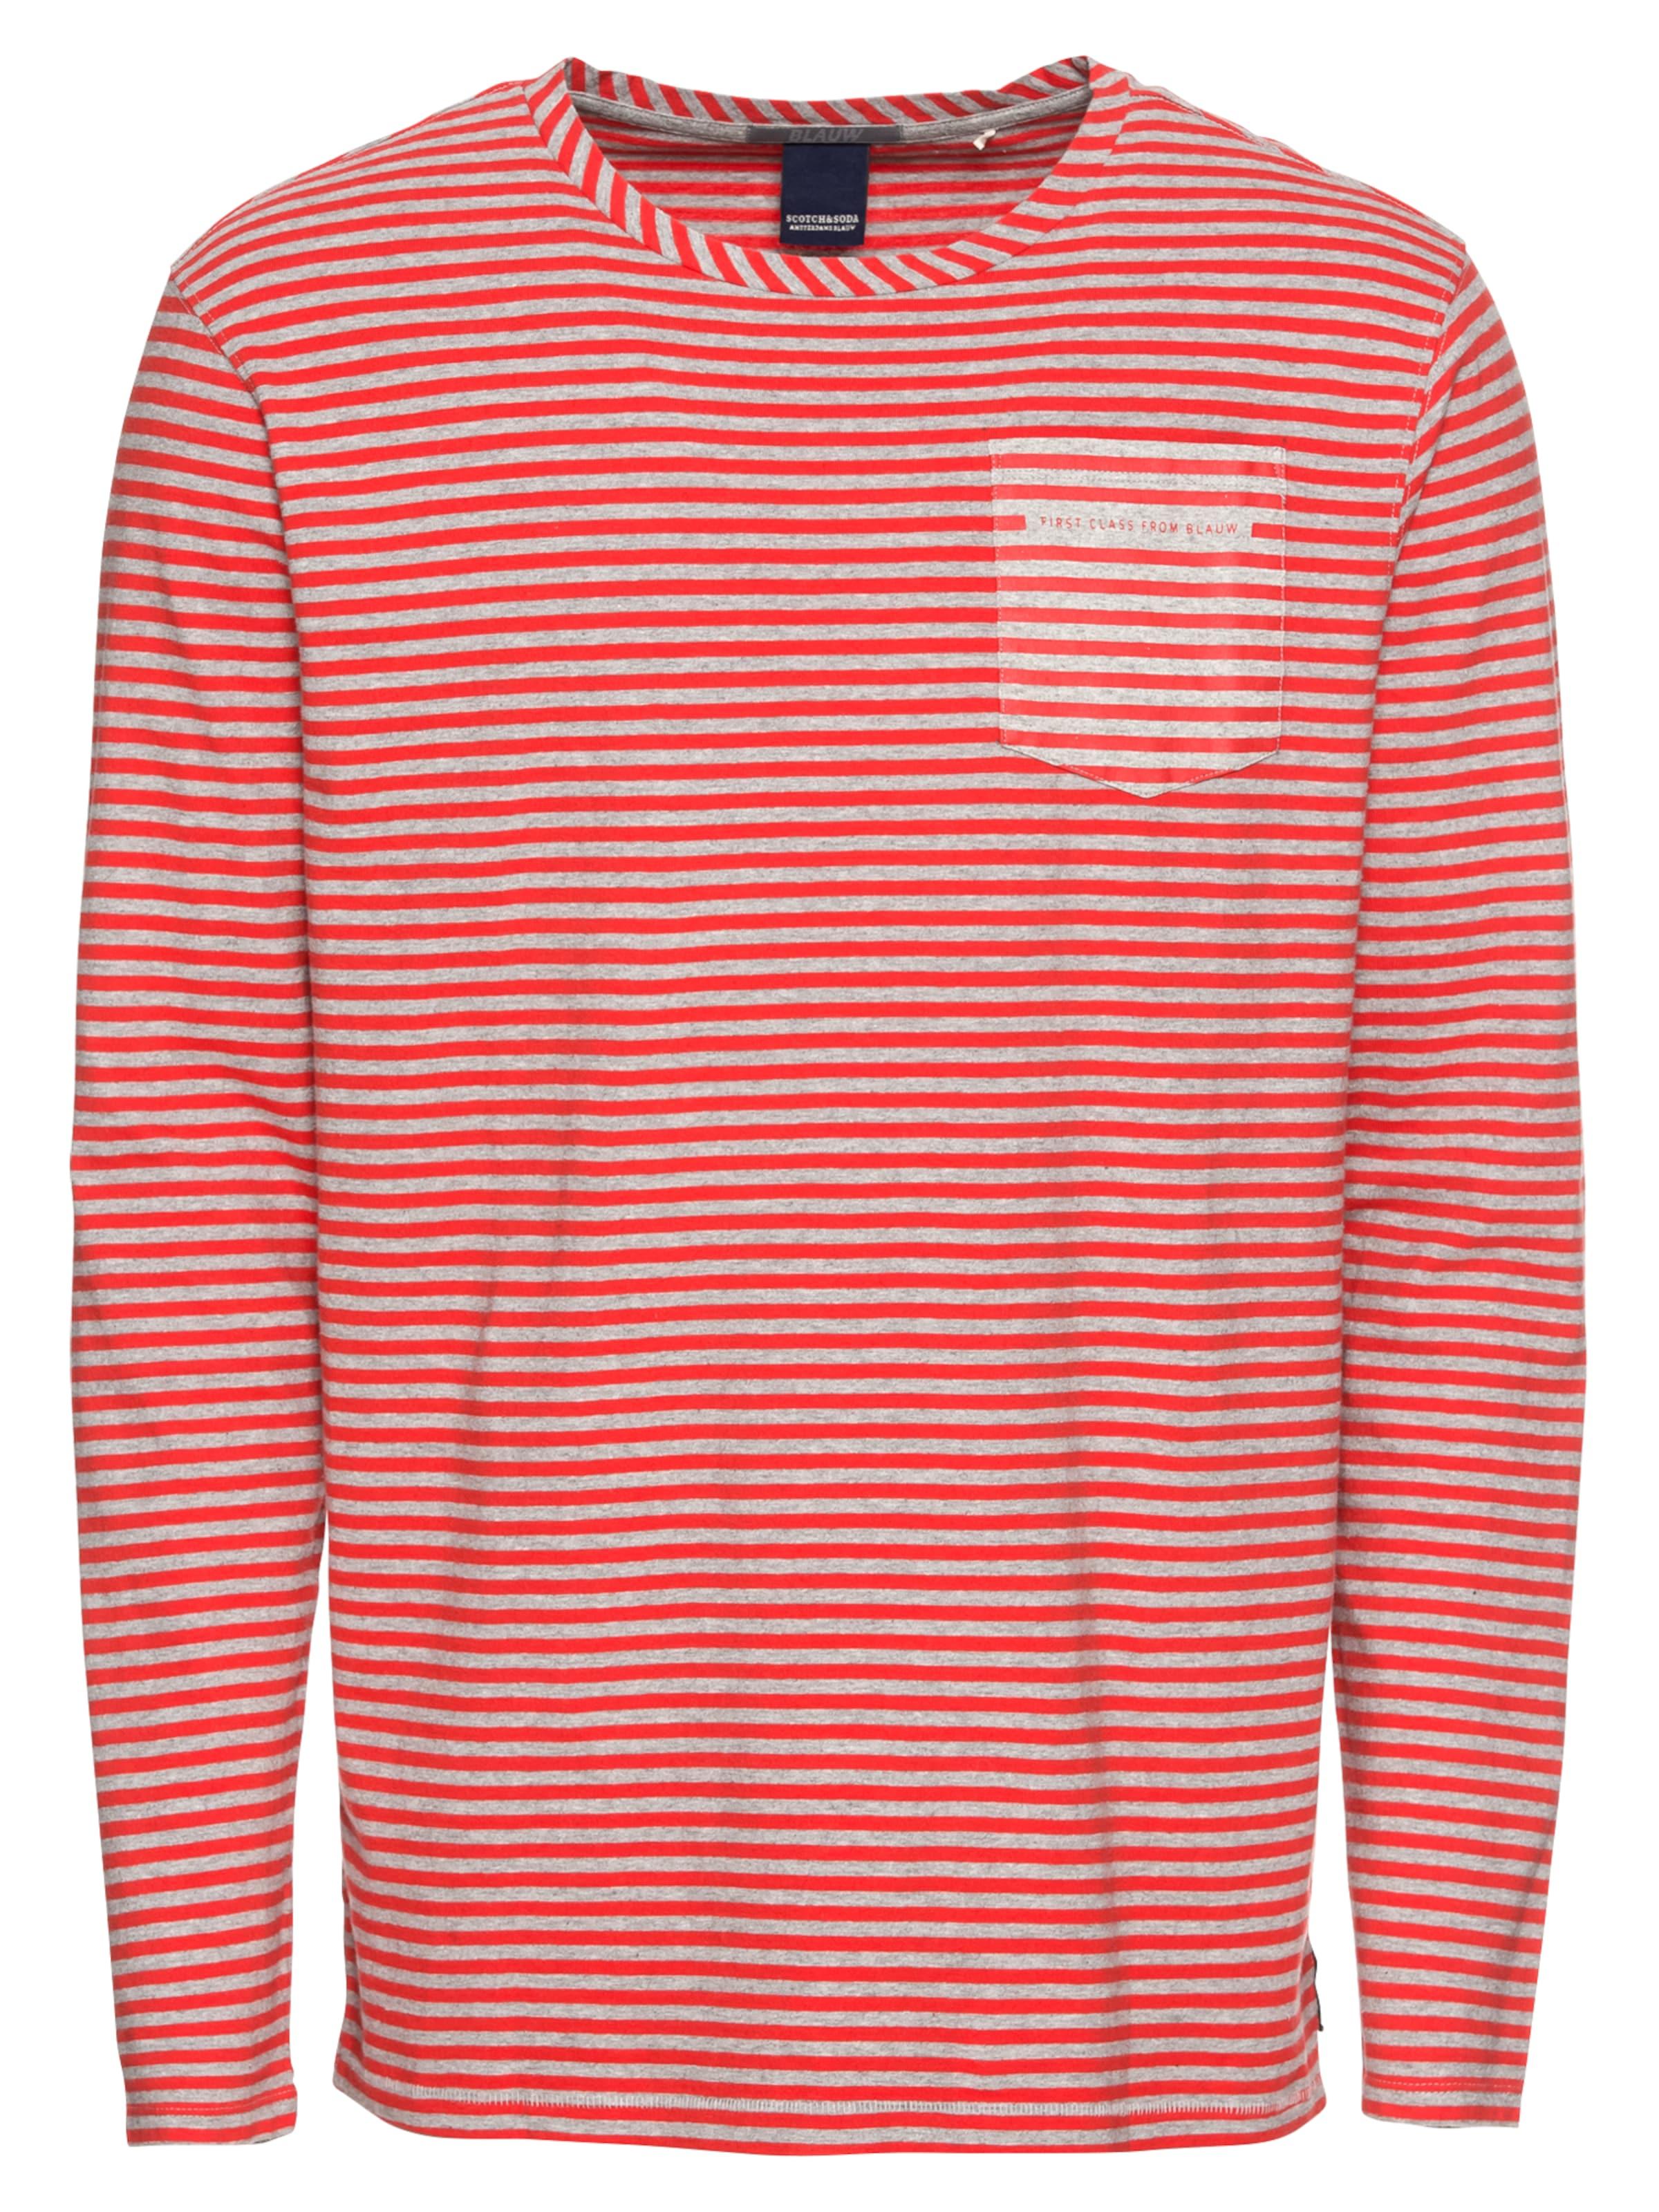 Stripe Long With En Rose Printed Artwork Blauw Pocket' Soda shirt 'ams Tee T Sleeve amp; Scotch Y8HwTT